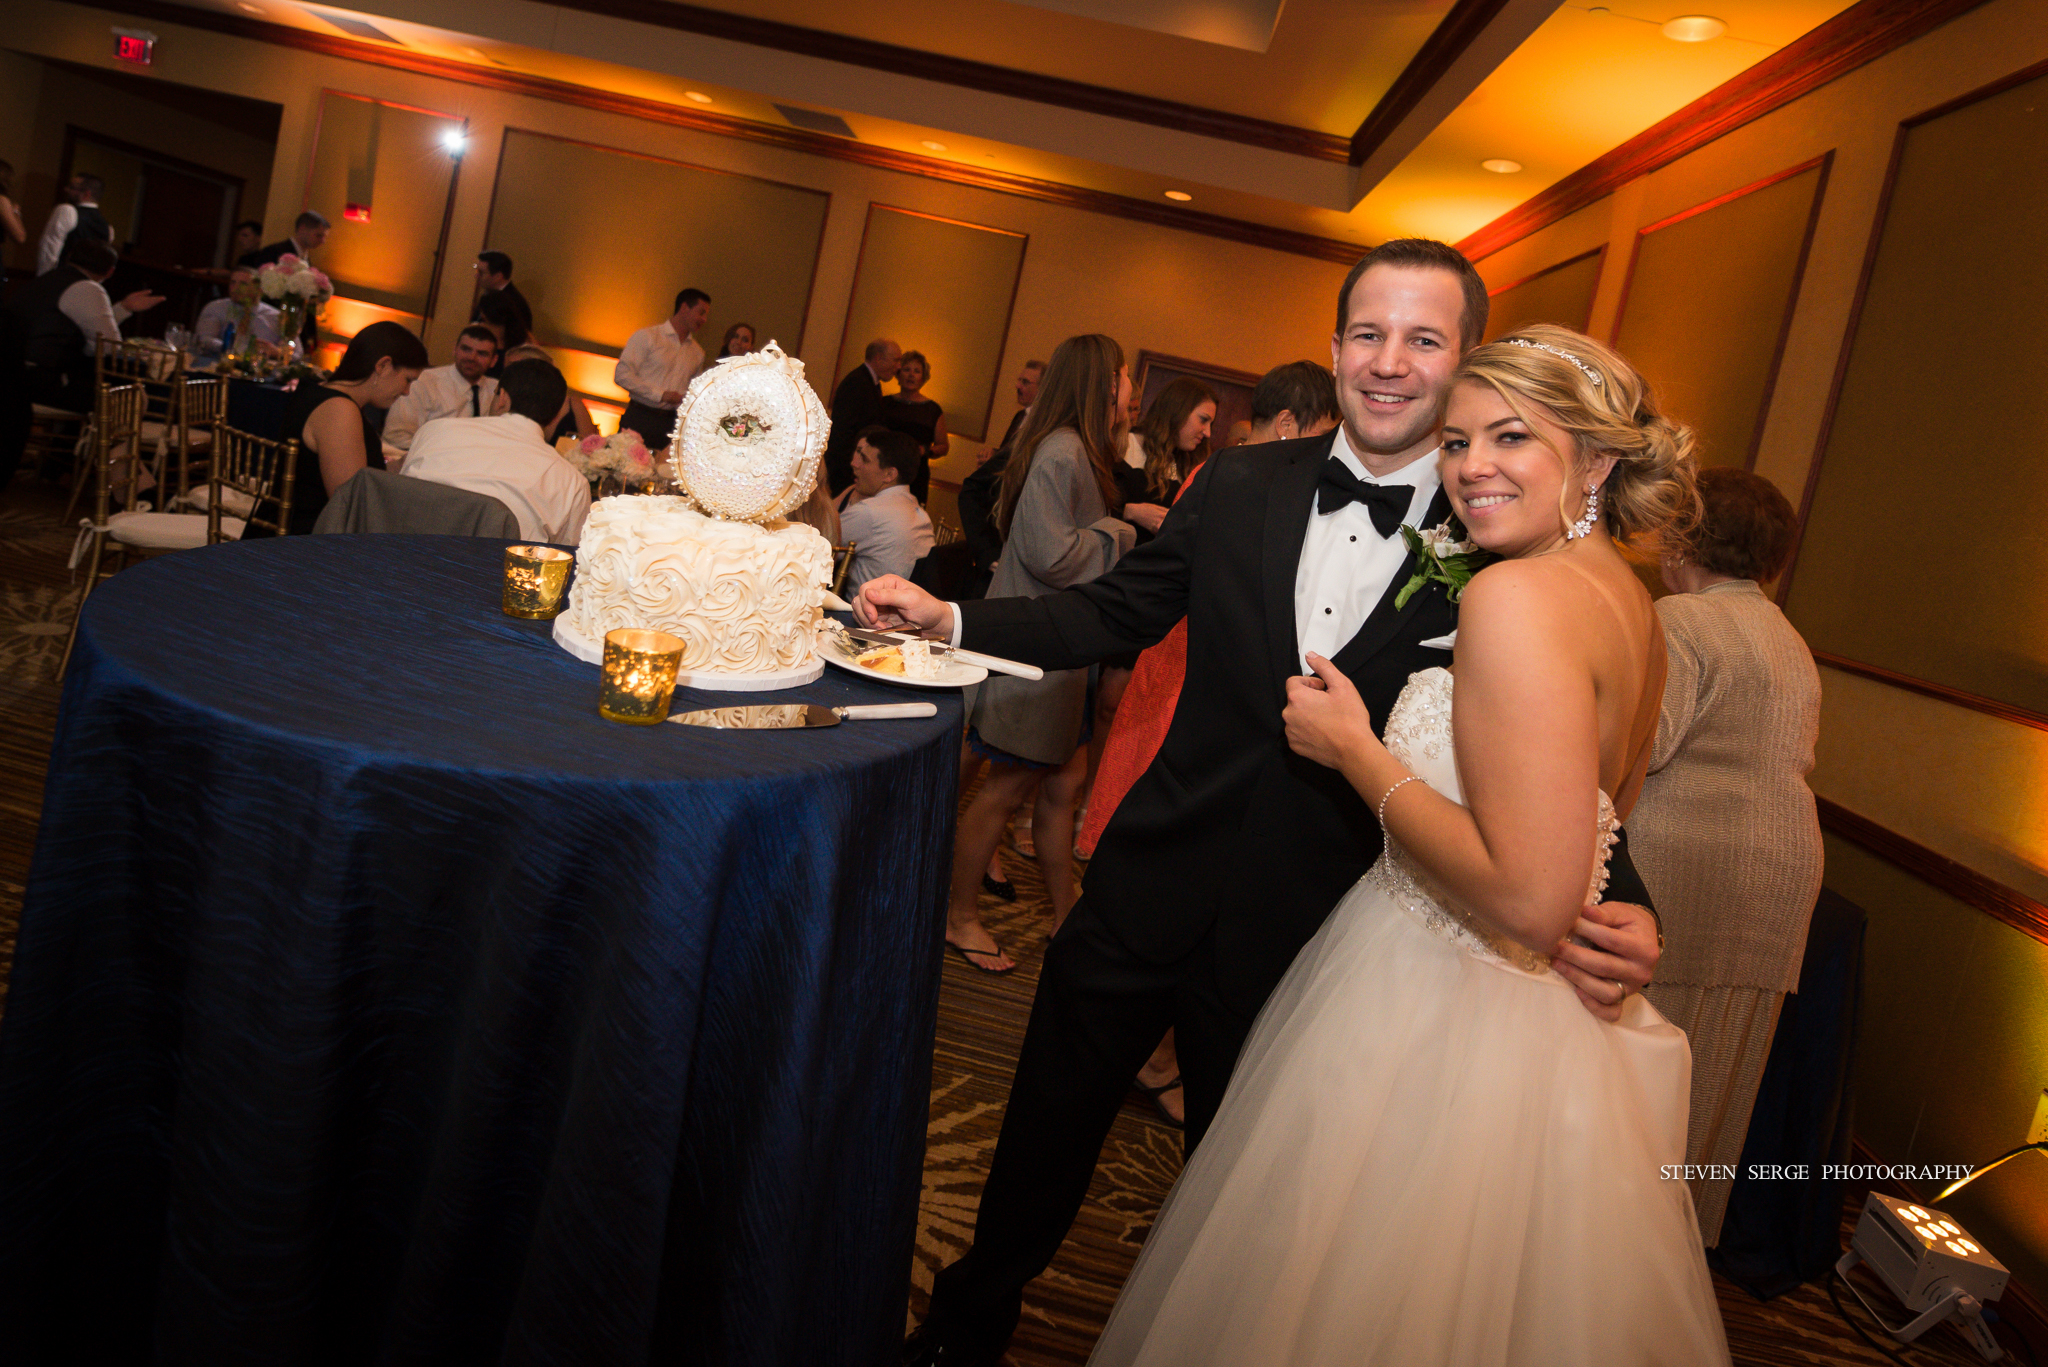 scranton-wedding-photographers-hilton-steven-serge-photography-25.jpg